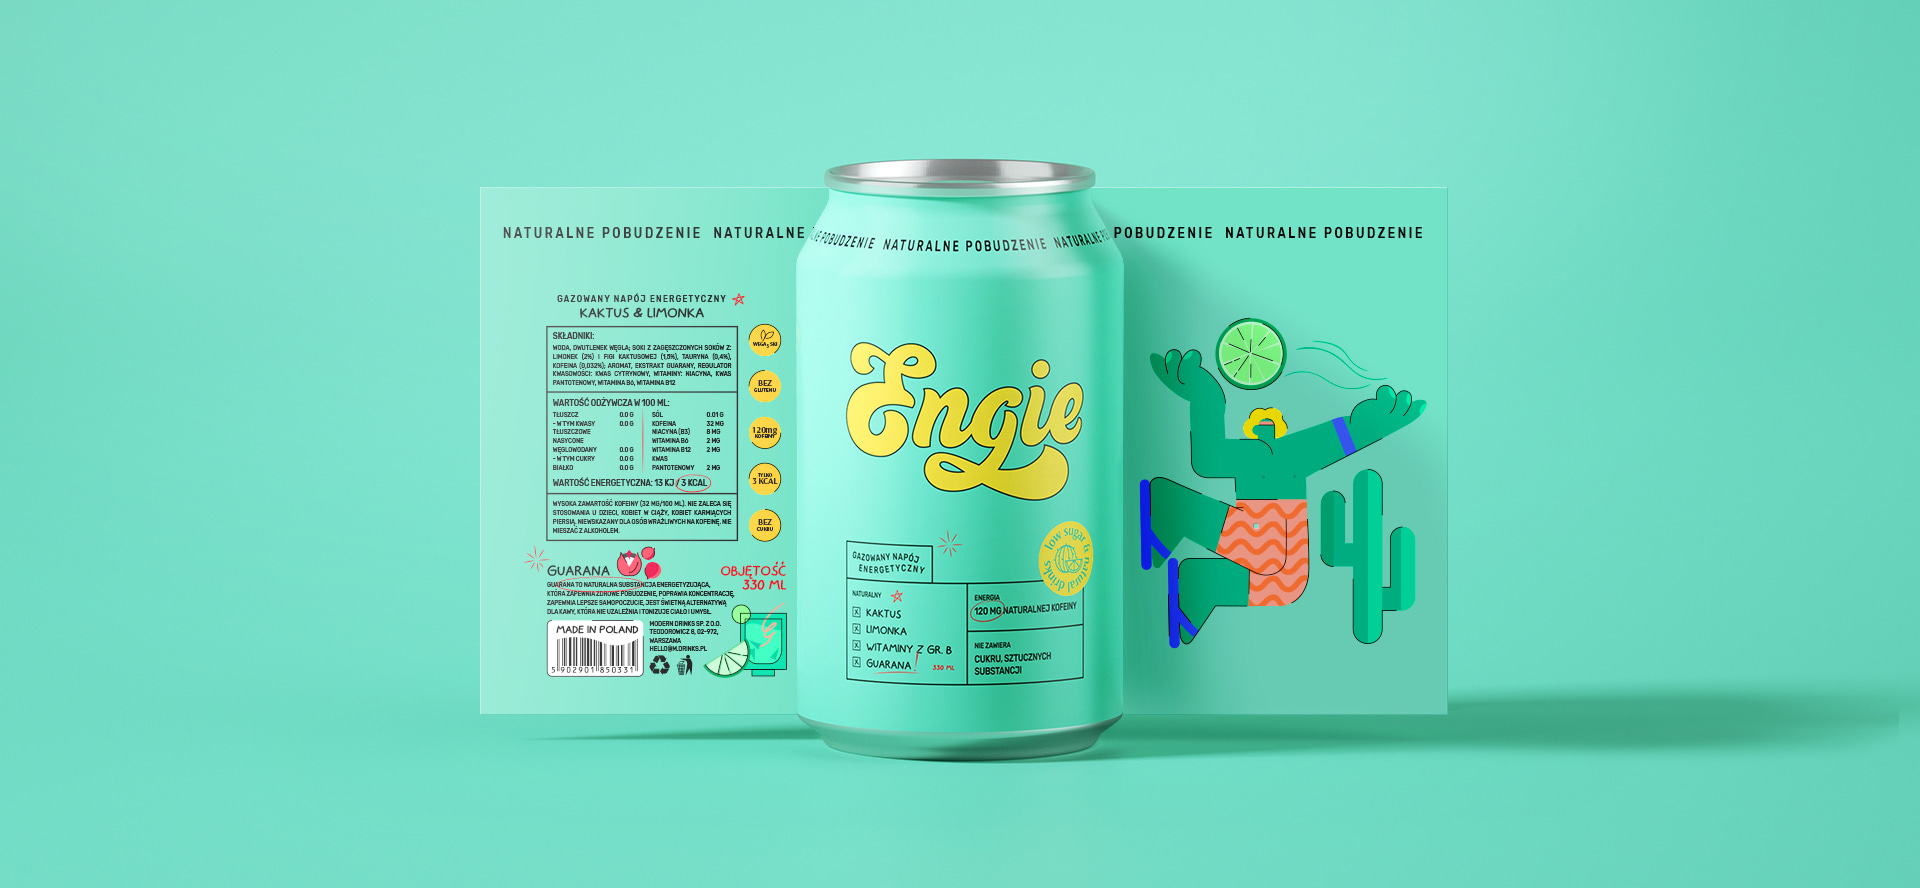 ENGIE image